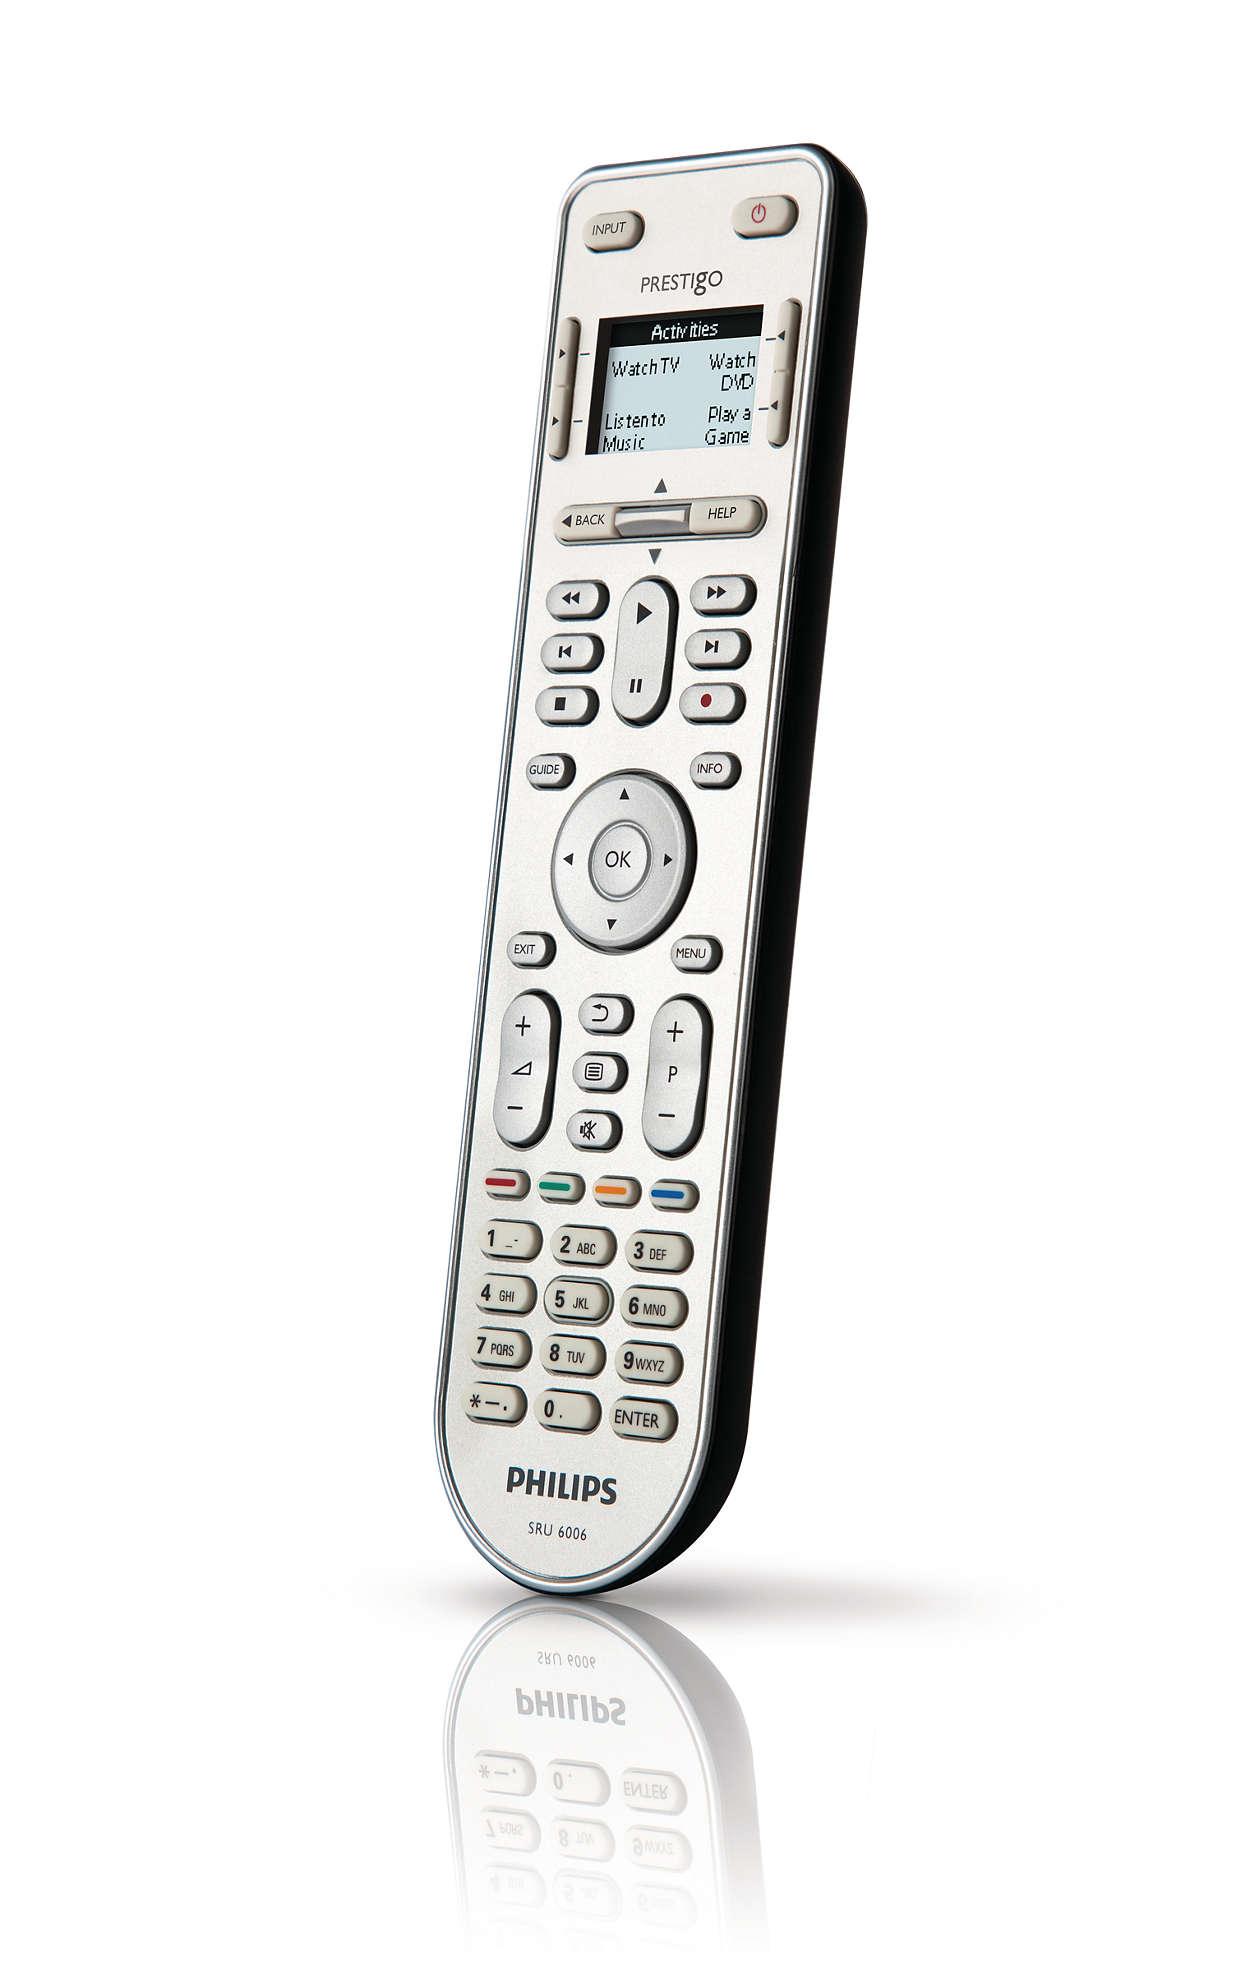 Prestigo Universal remote control SRU6006/10 | Philips